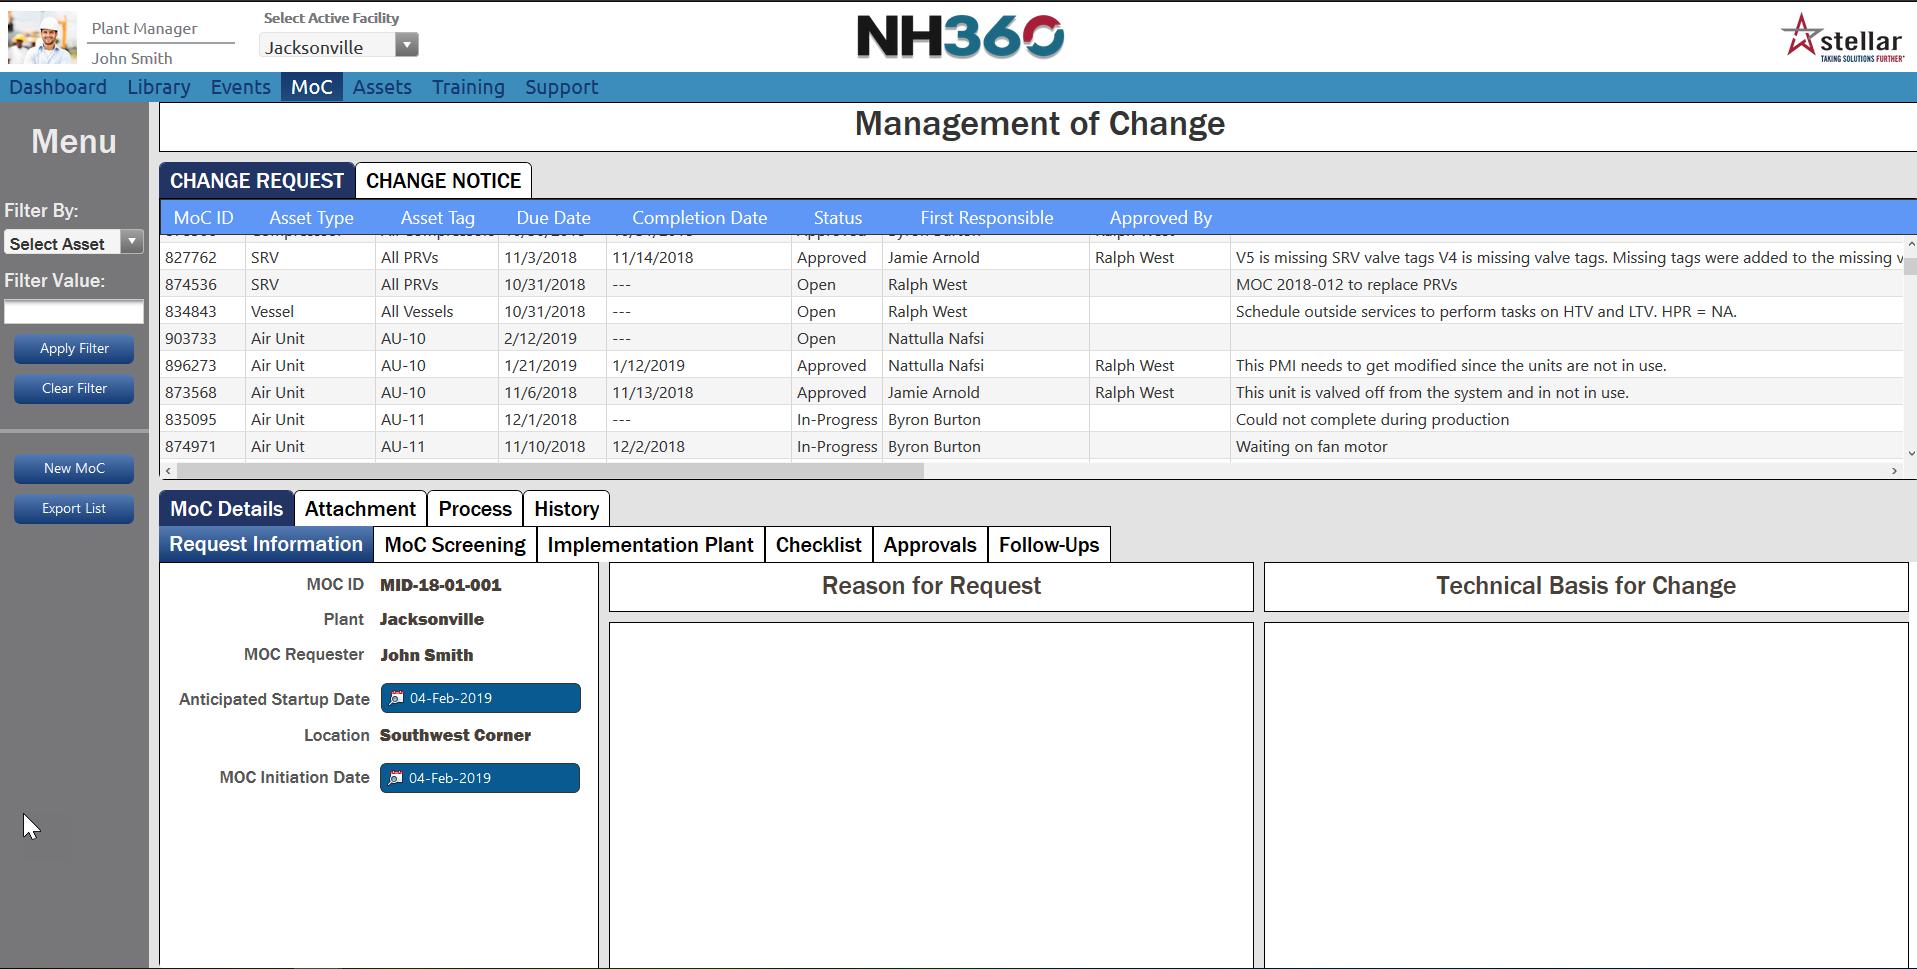 Digital PSM: A Sneak Peek at Stellar's New Compliance Software Platform